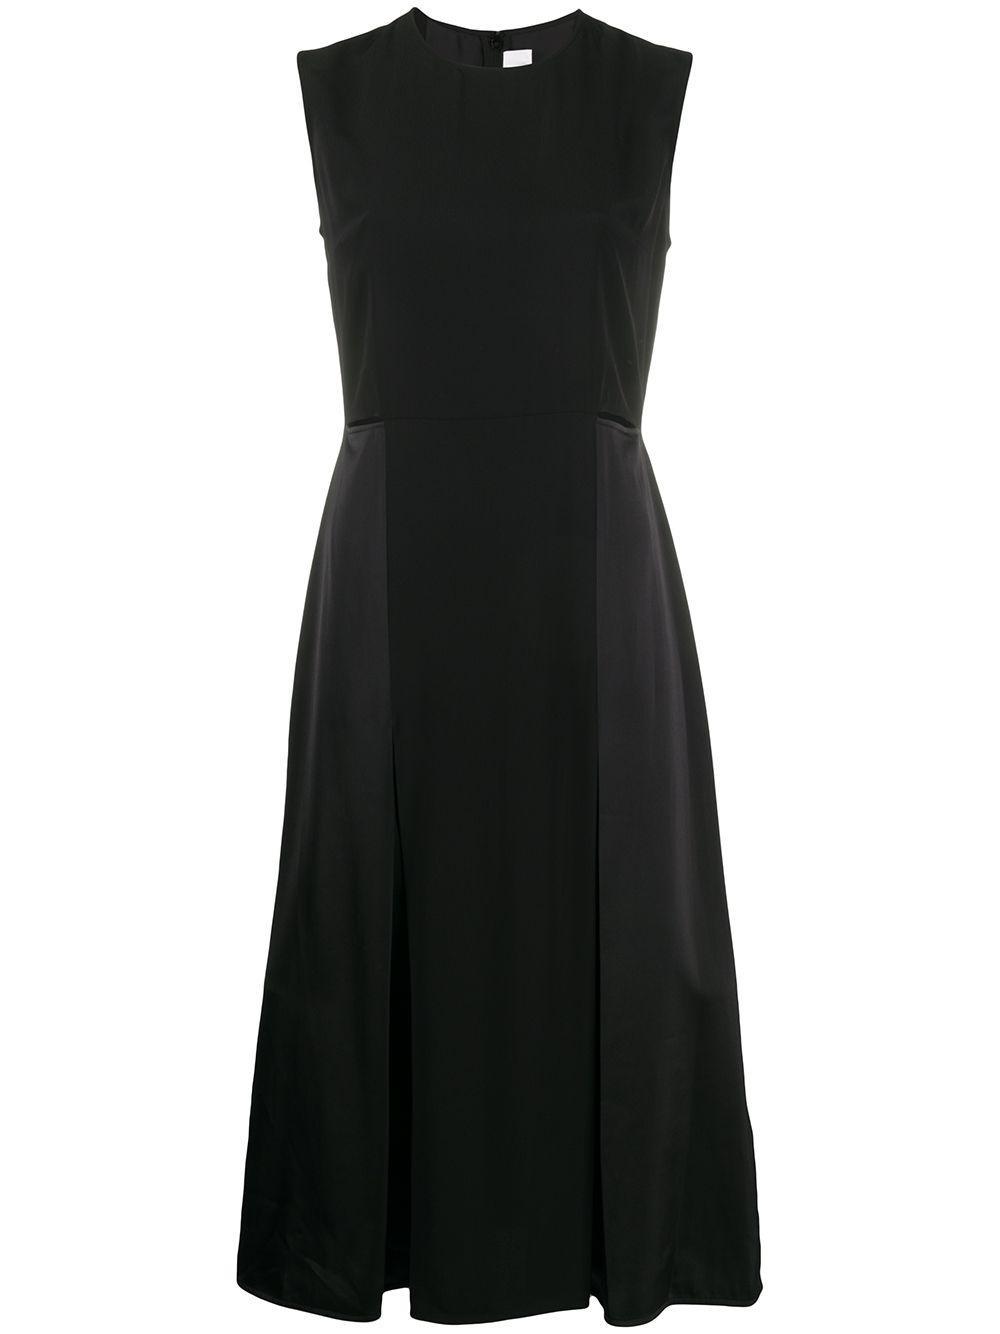 Sleeveless Crepe Satin Slit Detail Dress Item # 2220WDR001021B